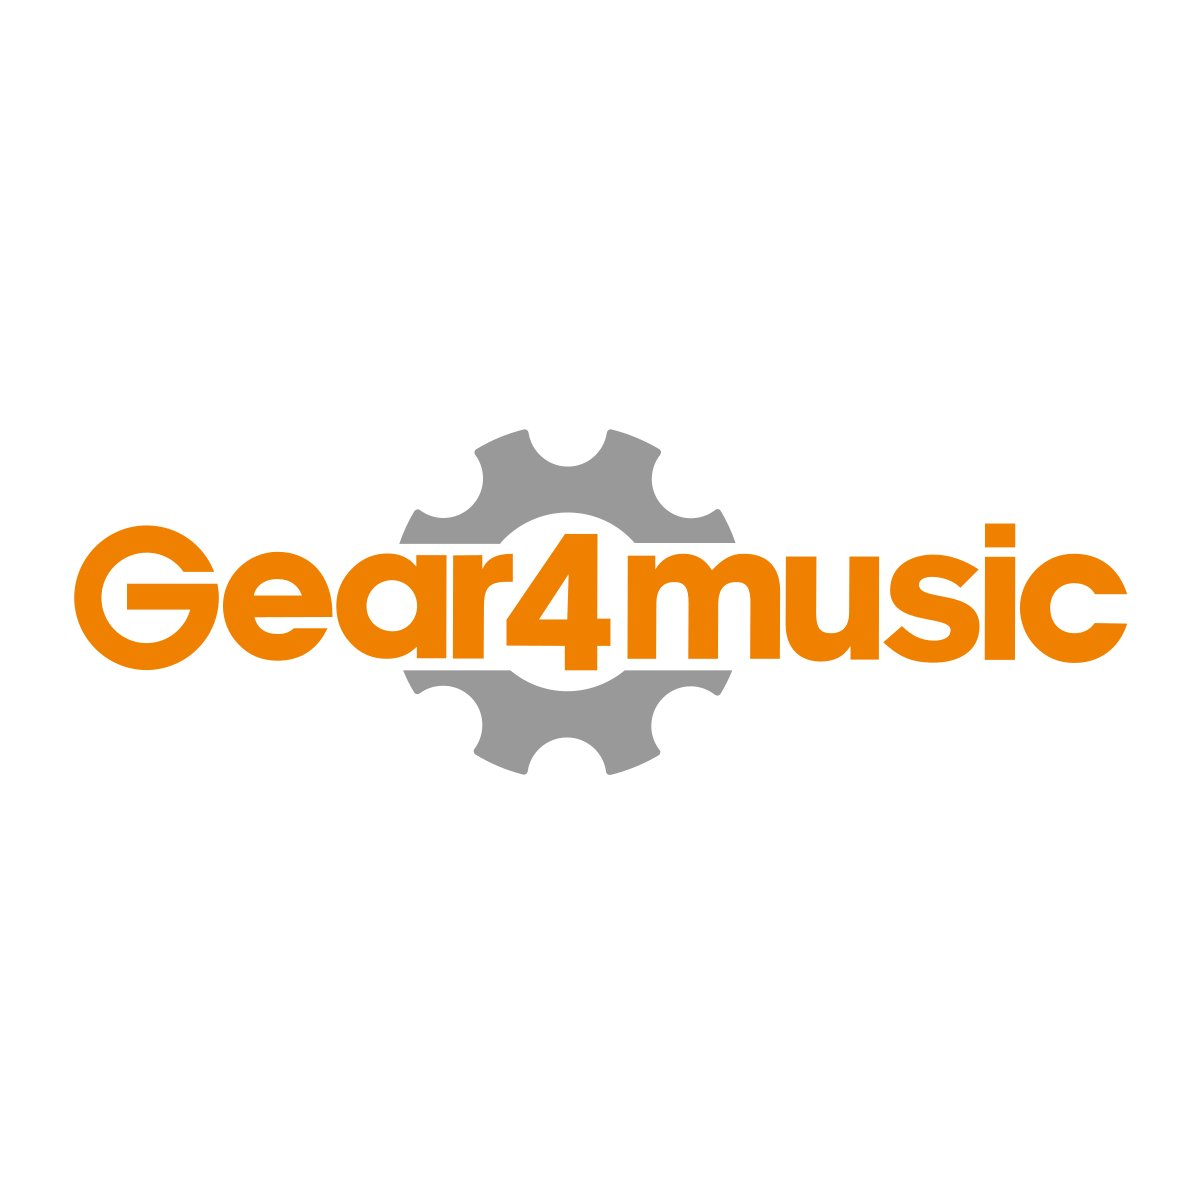 MK-5000 prenosný Keyboard od Gear4music - kompletný balík